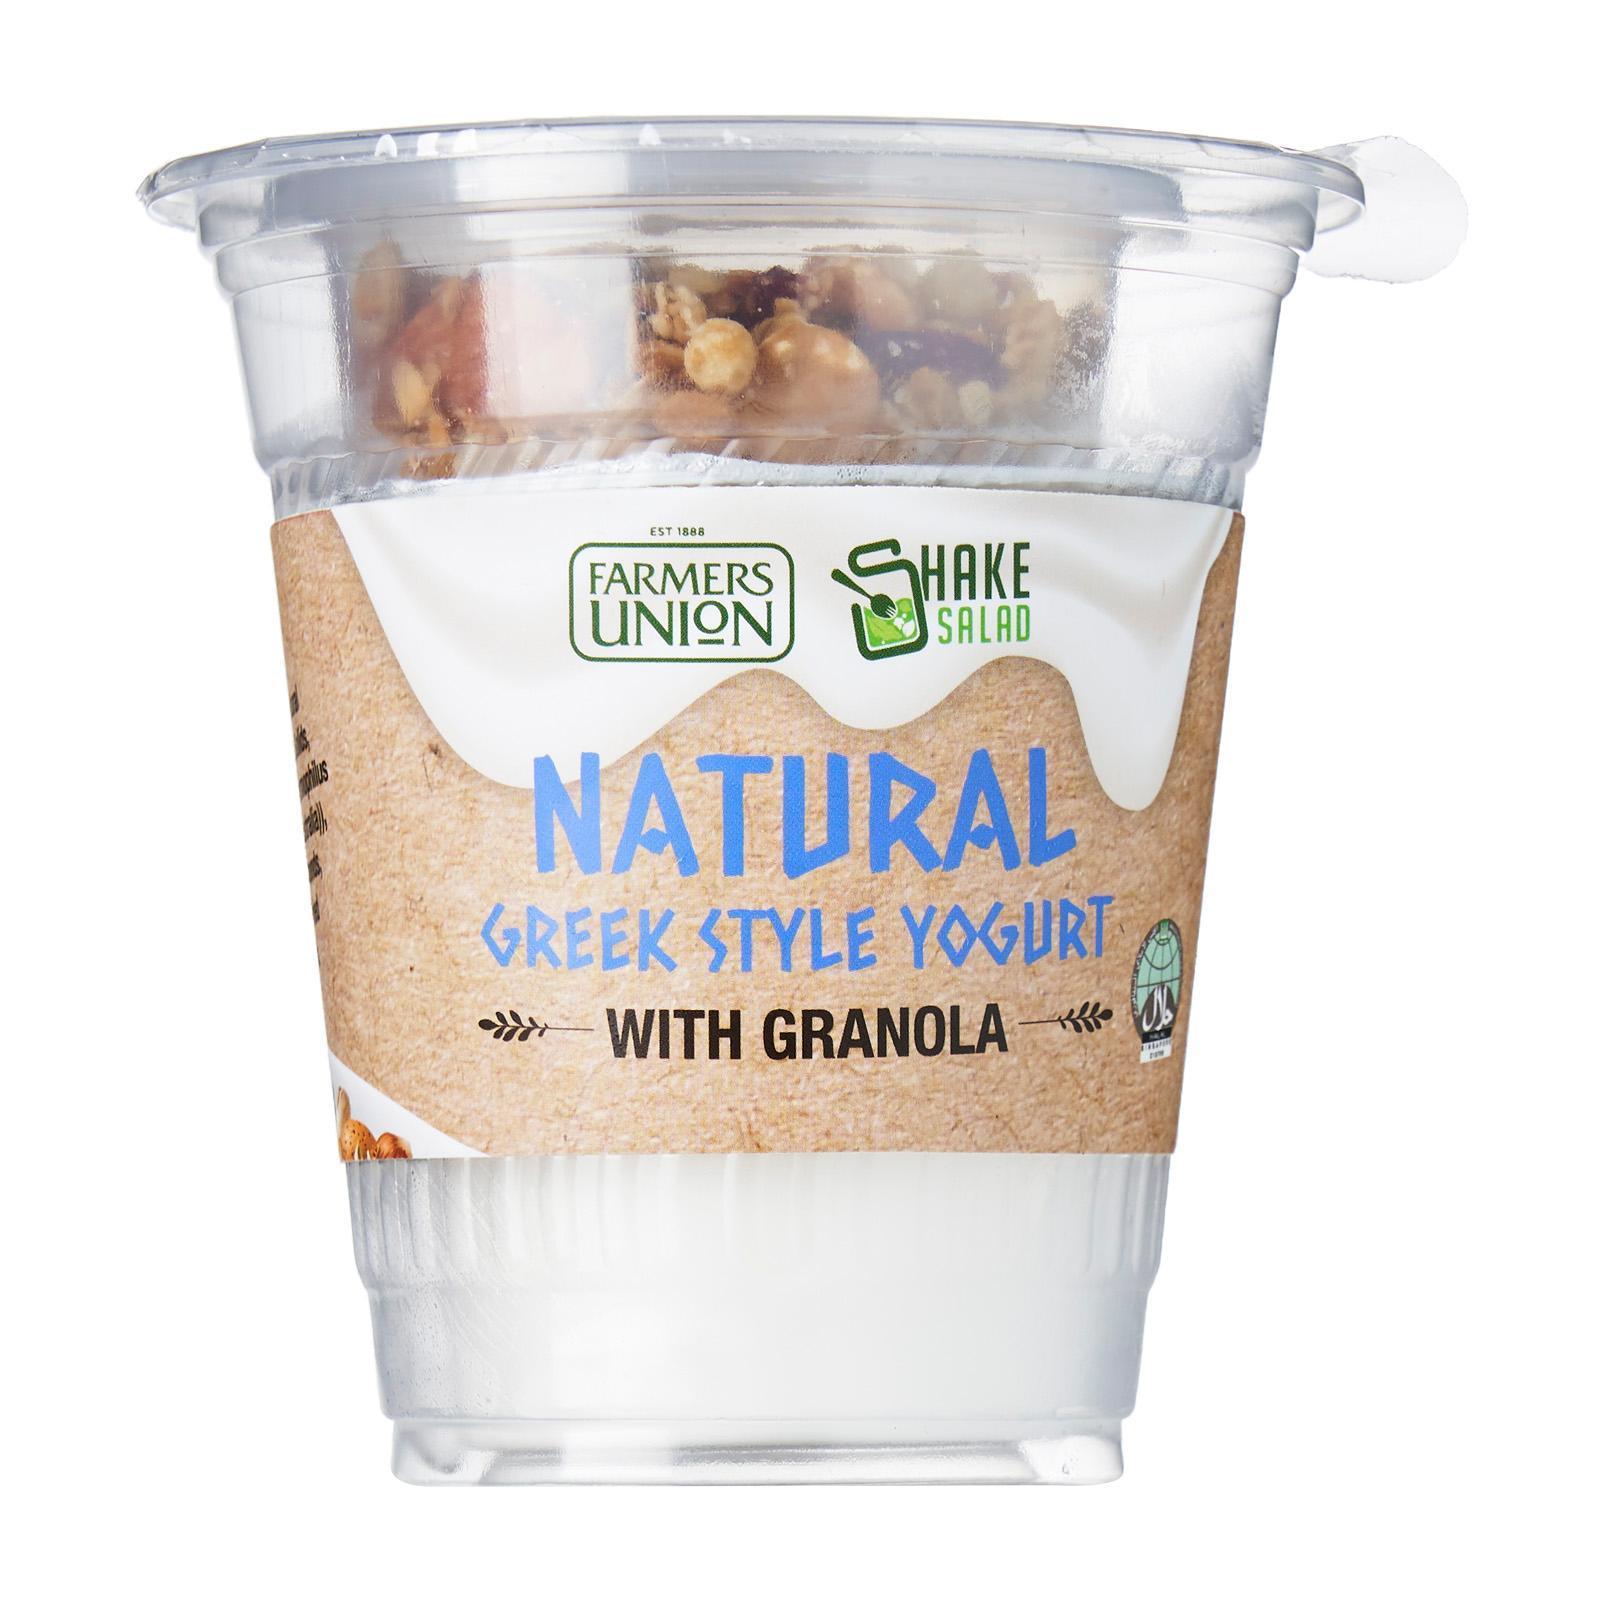 Shake Salad Farmers Union Natural Greek Yogurt With Granola